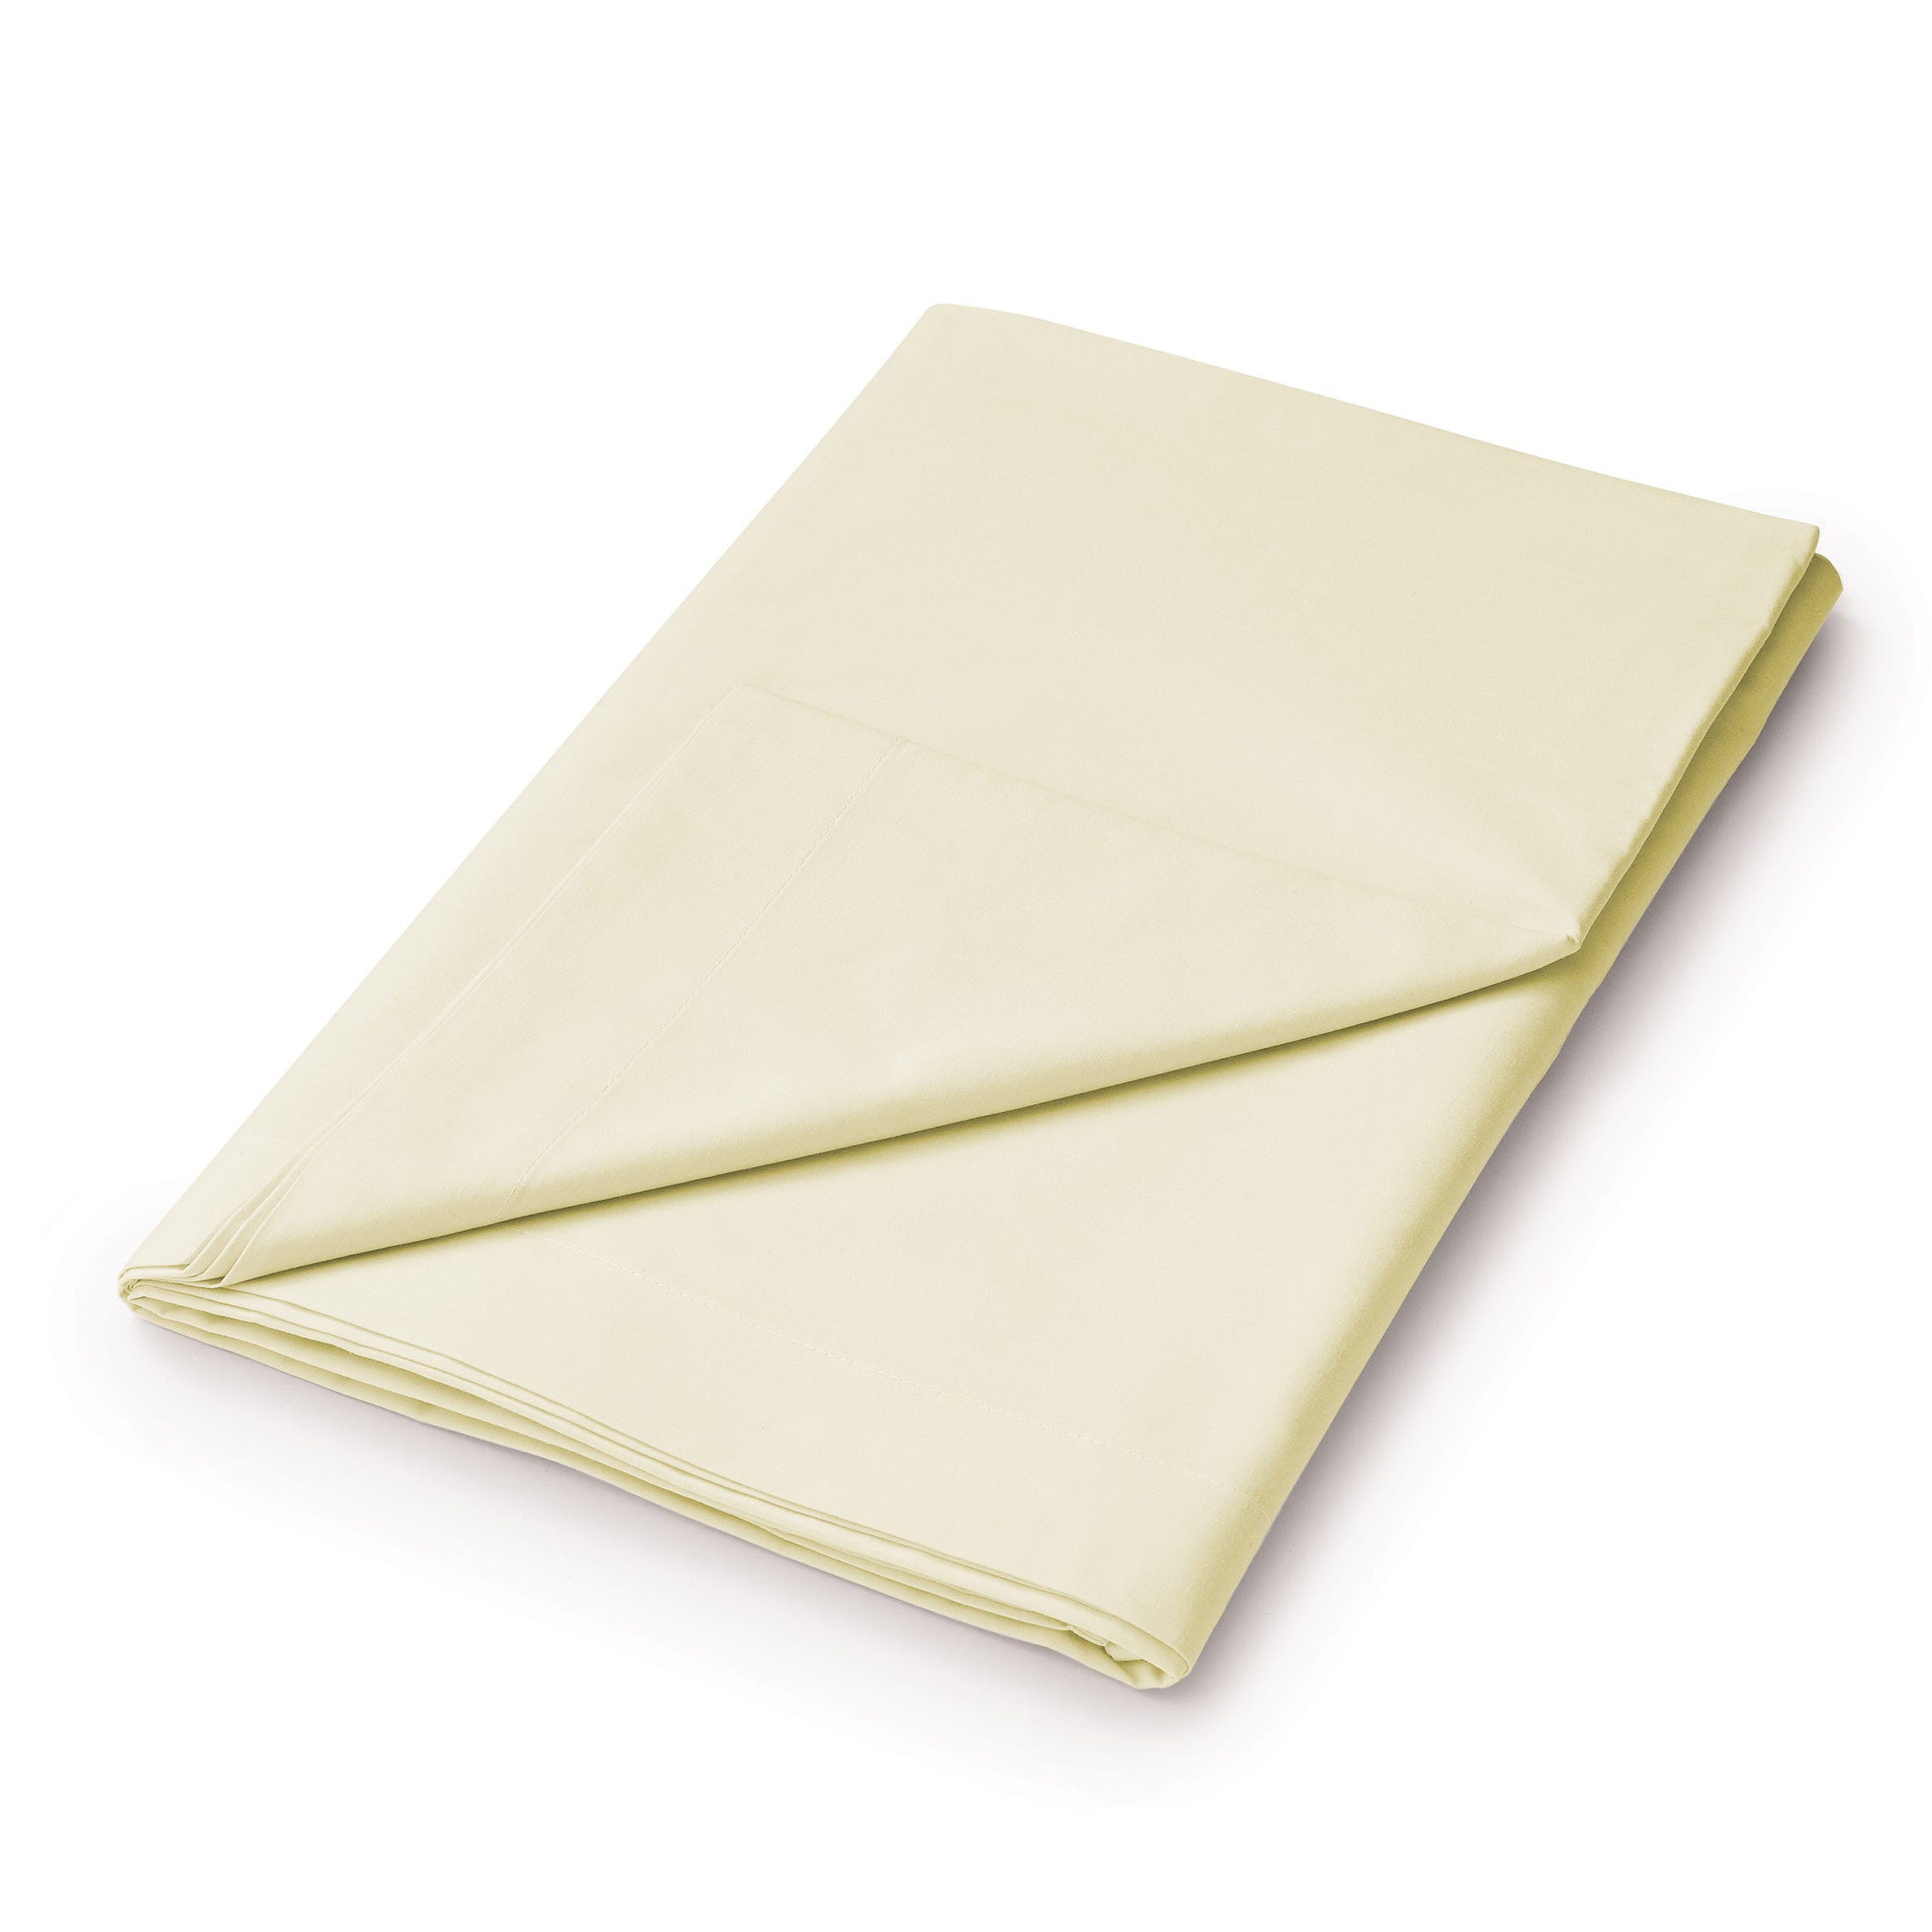 50/50 Plain Dye Percale Super Kingsize Flat Sheet, Citron